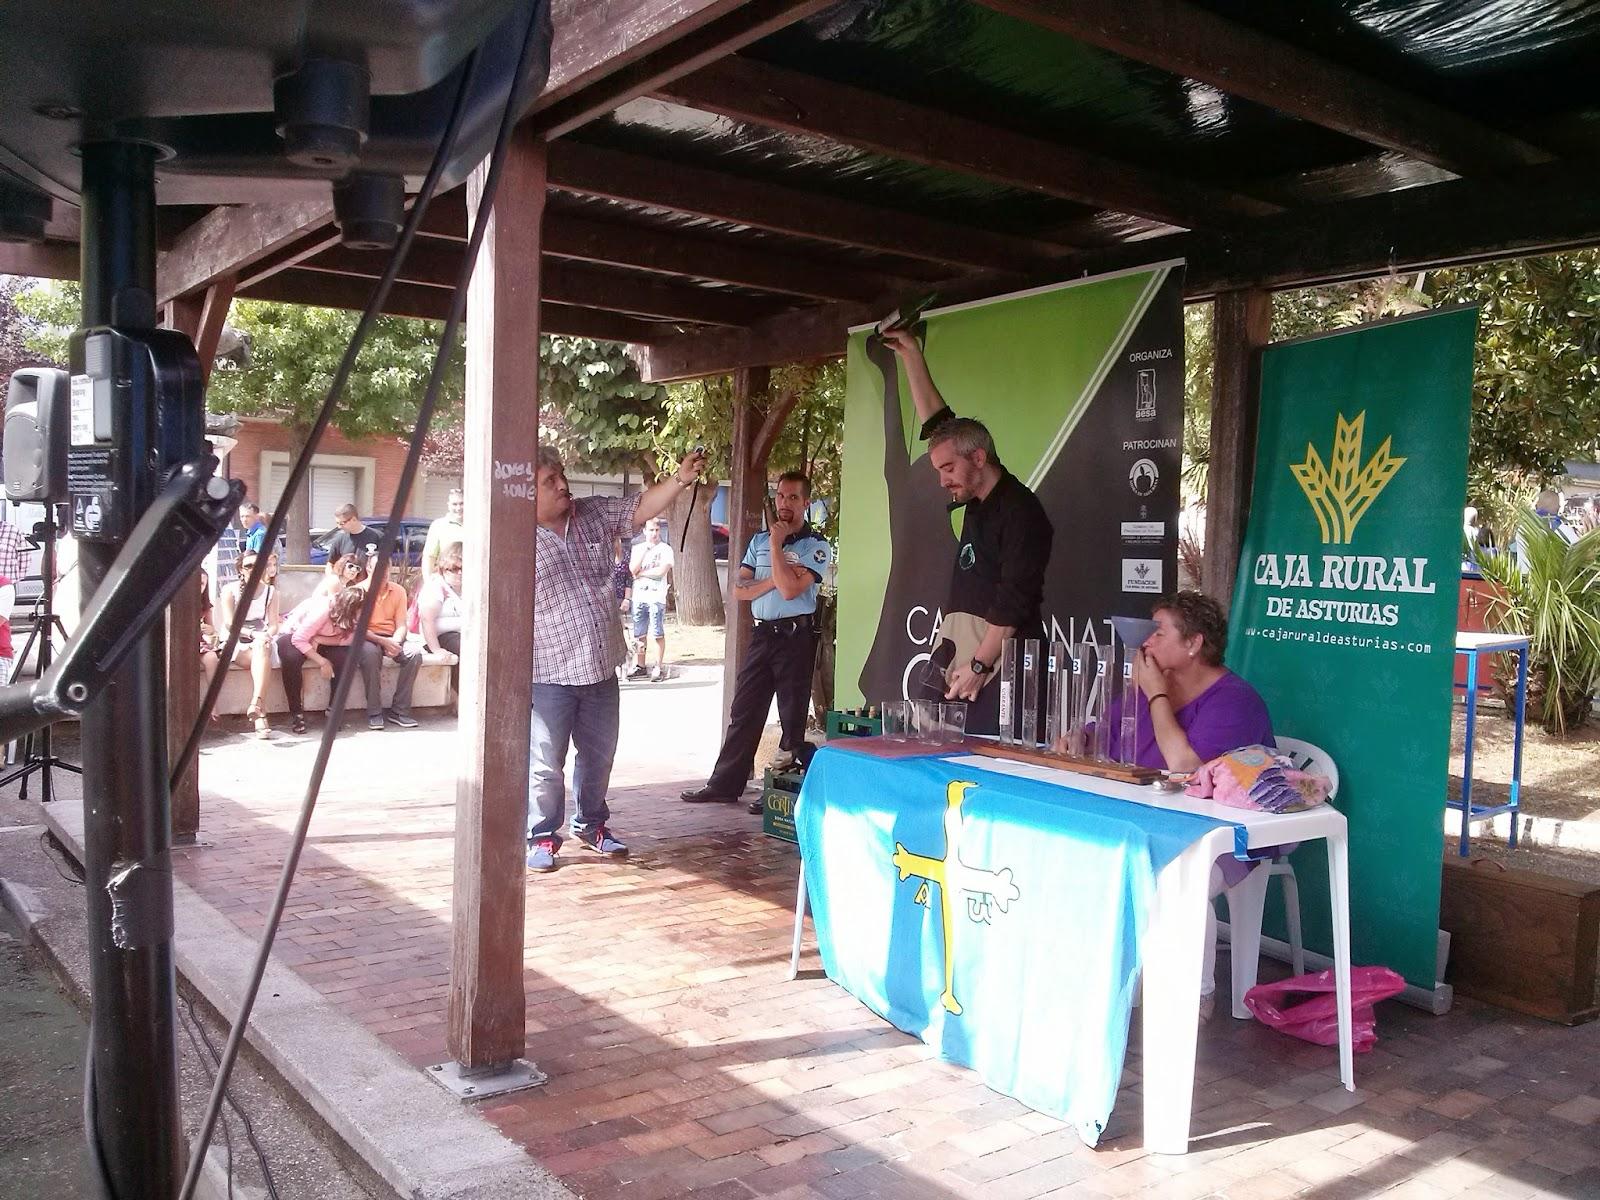 campeonato escanciadores sidra asturias candas concurso